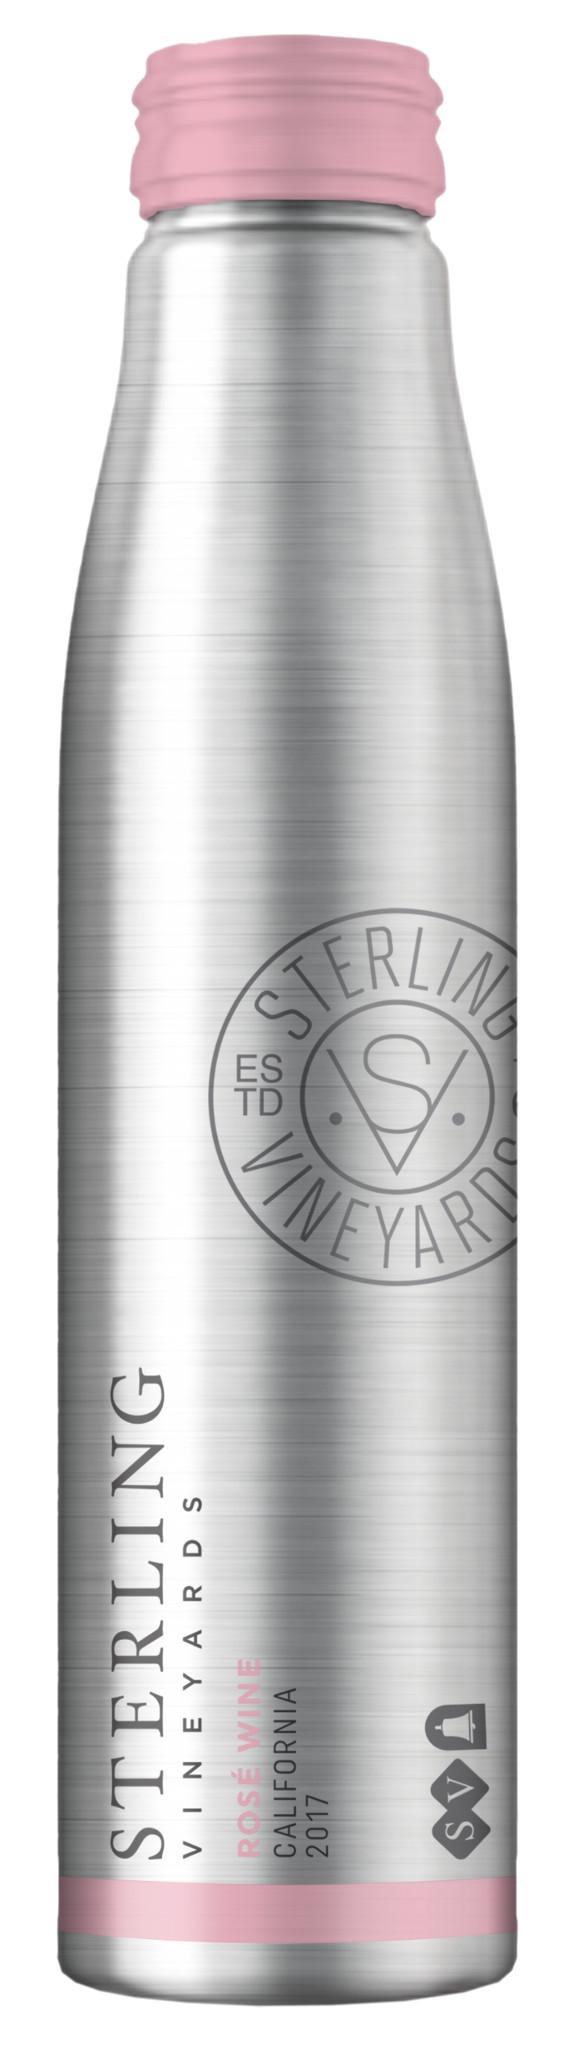 2017 Sterling Vintners Collection Rosé